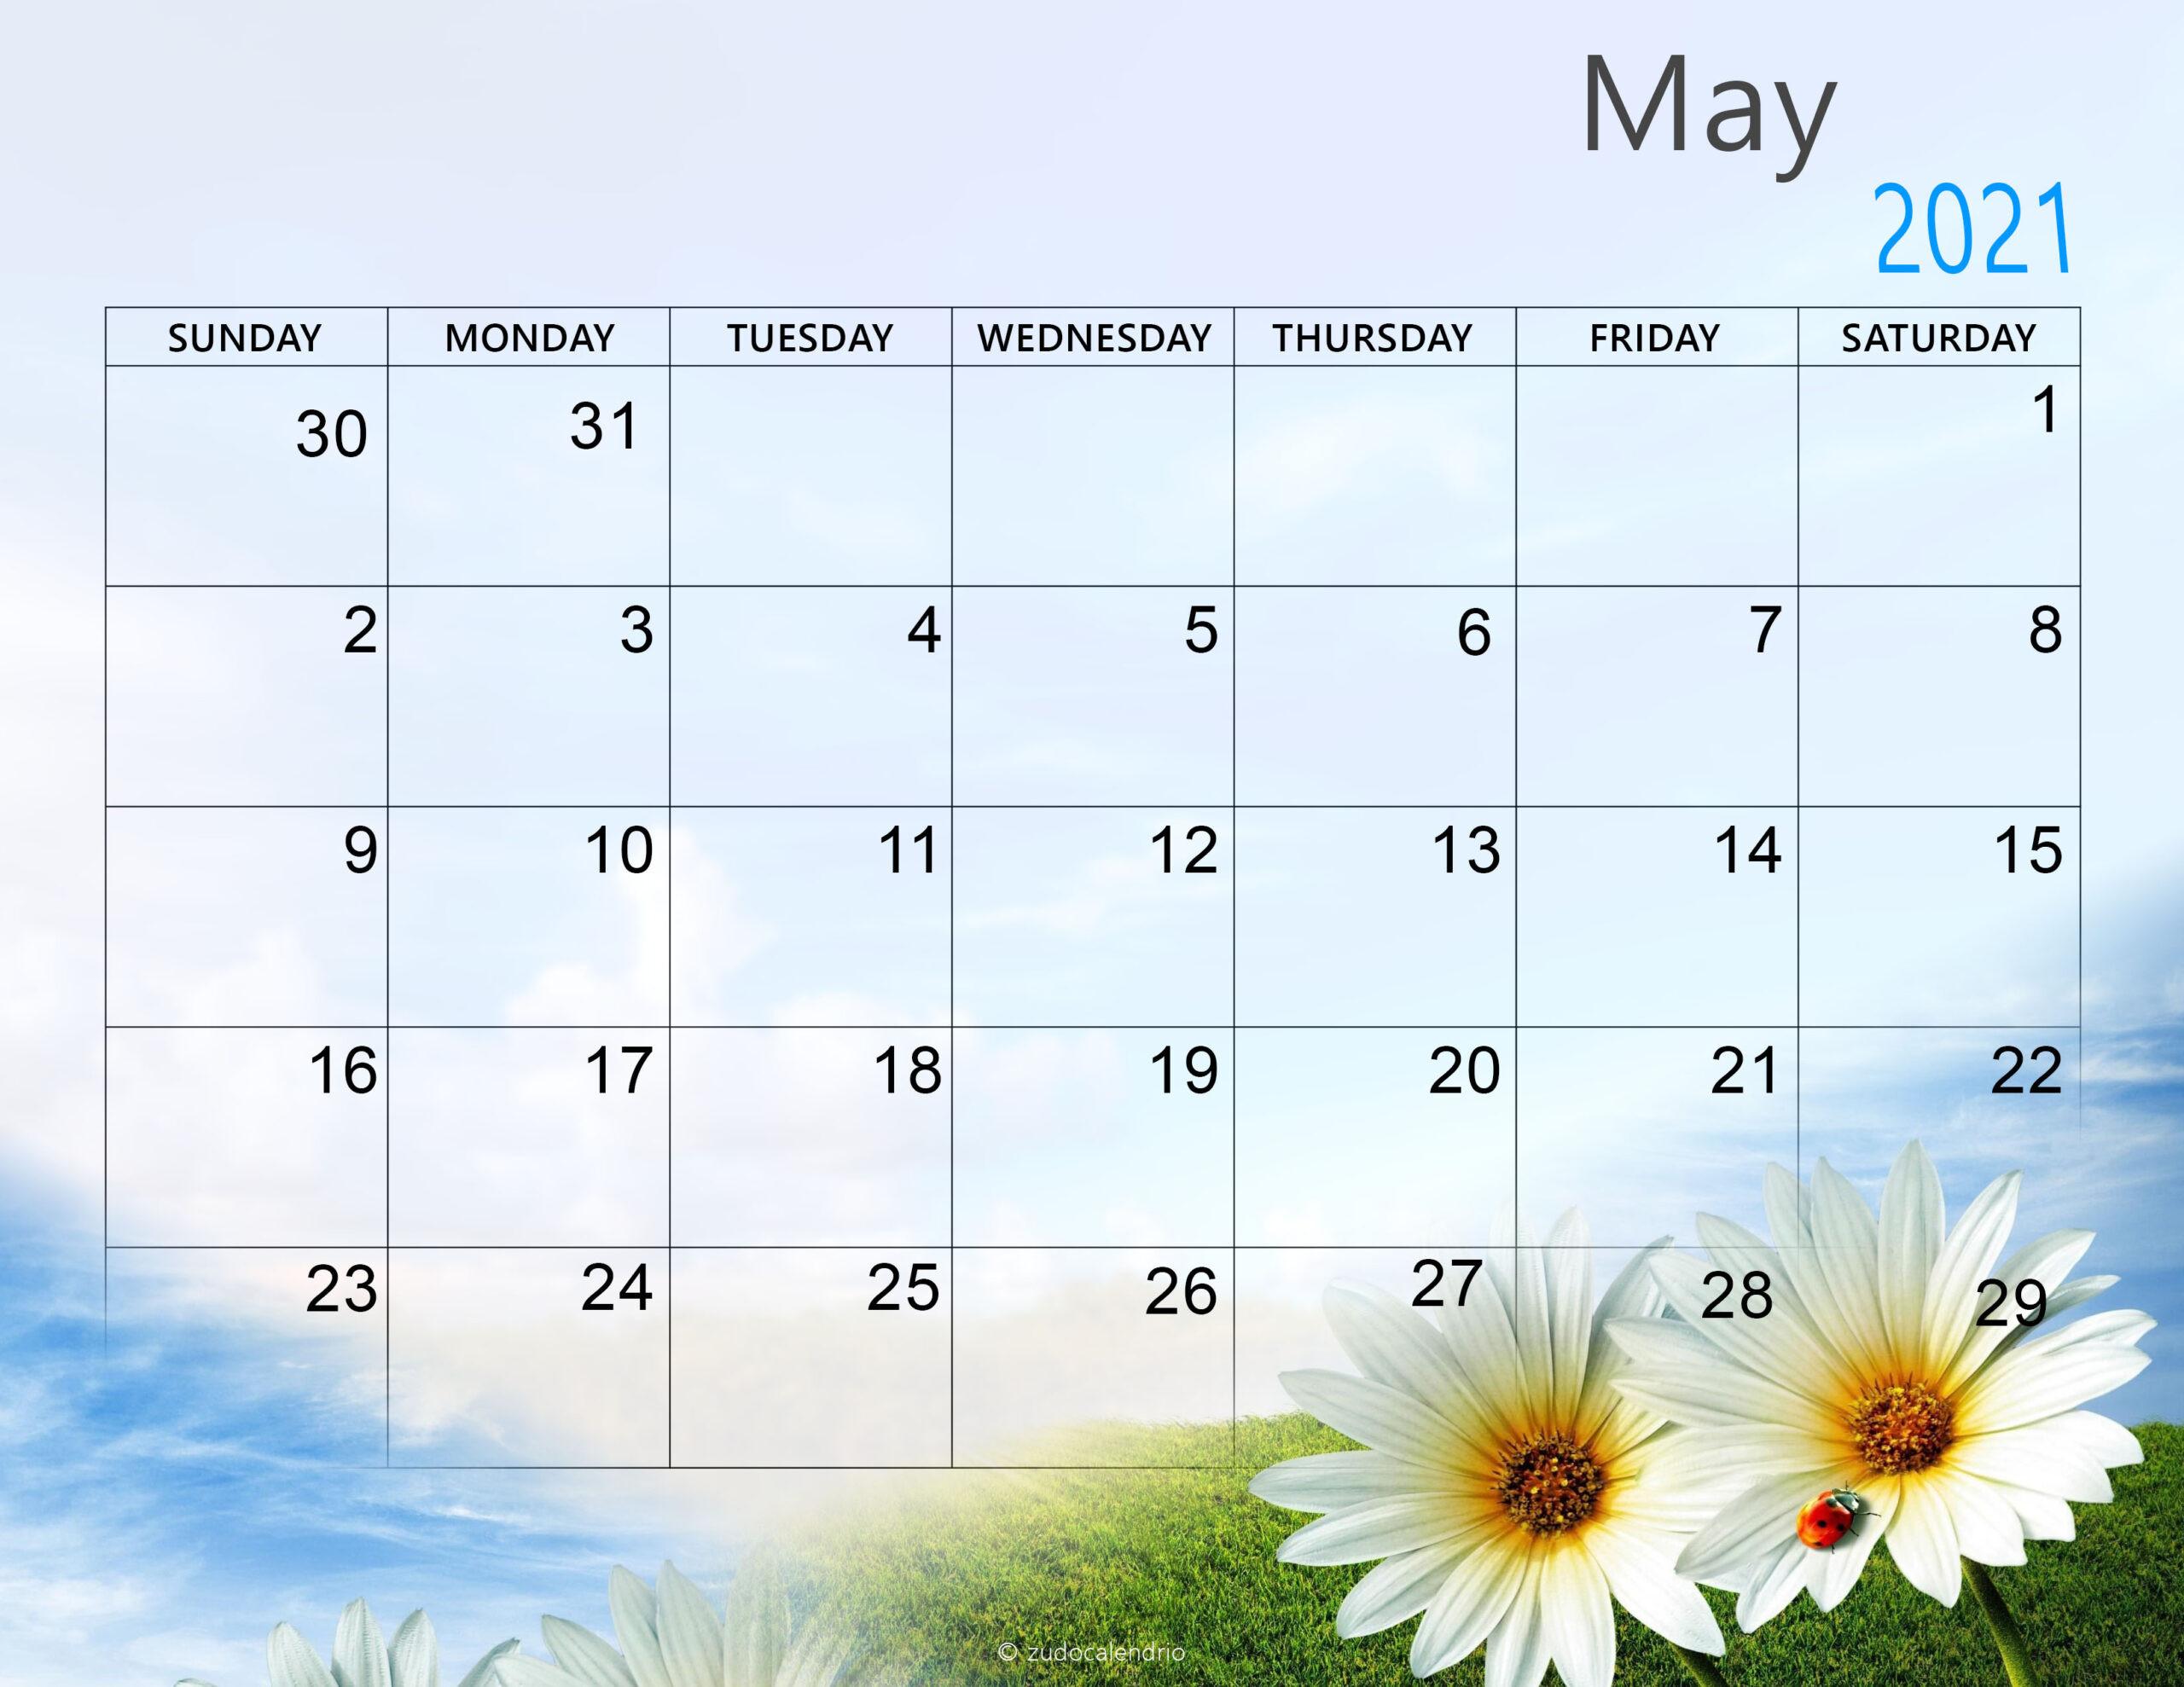 Cute May 2021 Calendar Printable Wallpaper - Thecalendarpedia-Monthly Calendar 2021 For Wallpaper